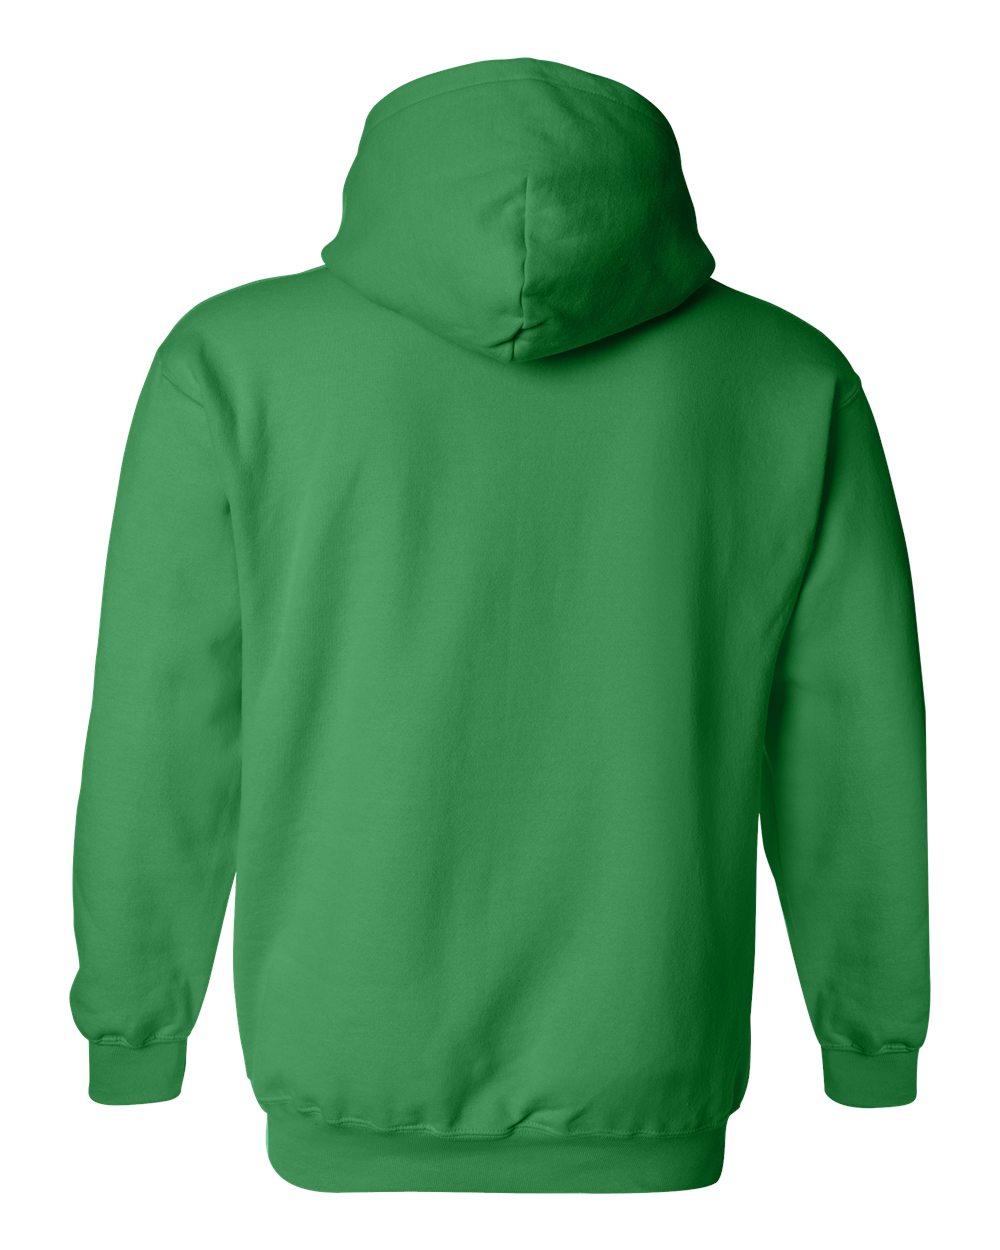 Gildan-Mens-Blank-Hoodie-Heavy-Blend-Hooded-Sweatshirt-Solid-18500-up-to-5XL thumbnail 43